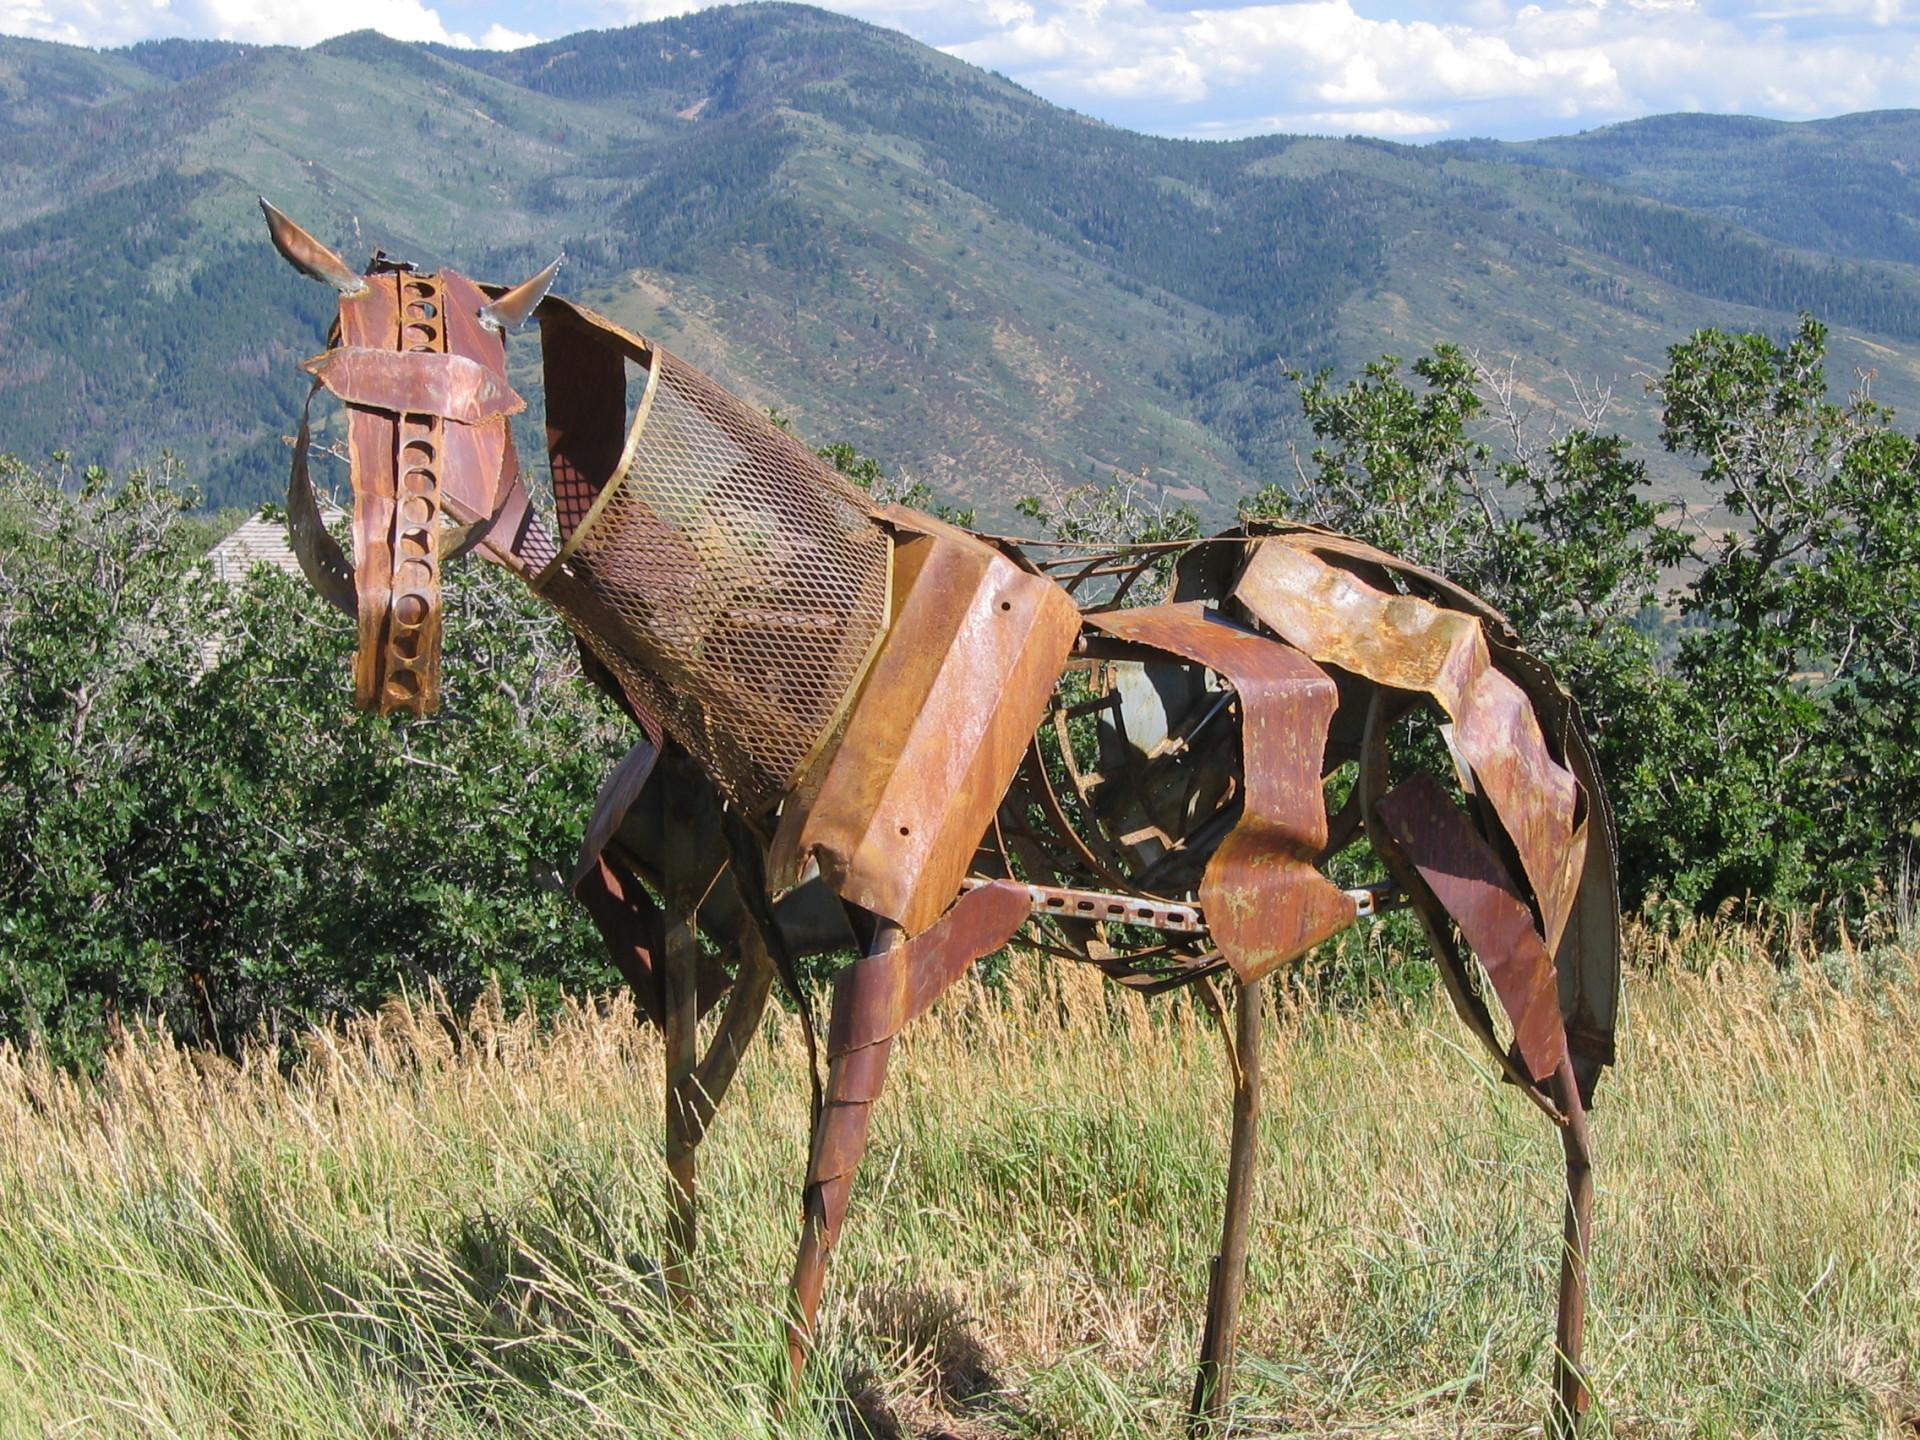 Life size horse sculpture, recycled steel, Utah, Rusty Croft, Carmel California